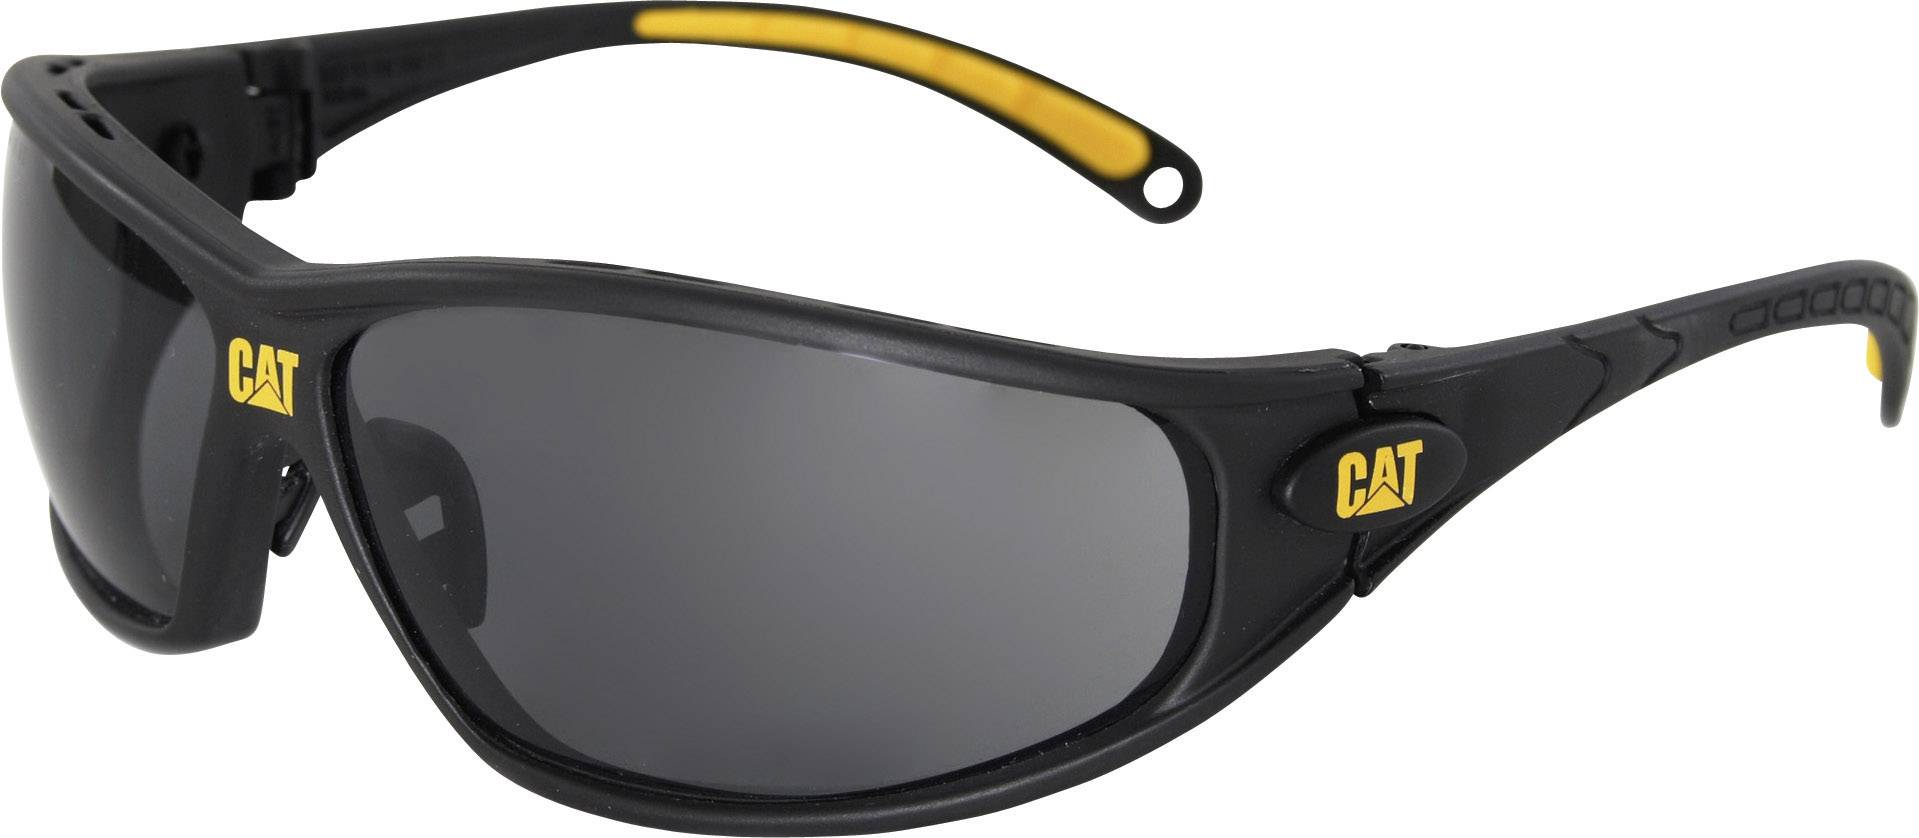 Ochranné brýle CAT Tread 104, šedá